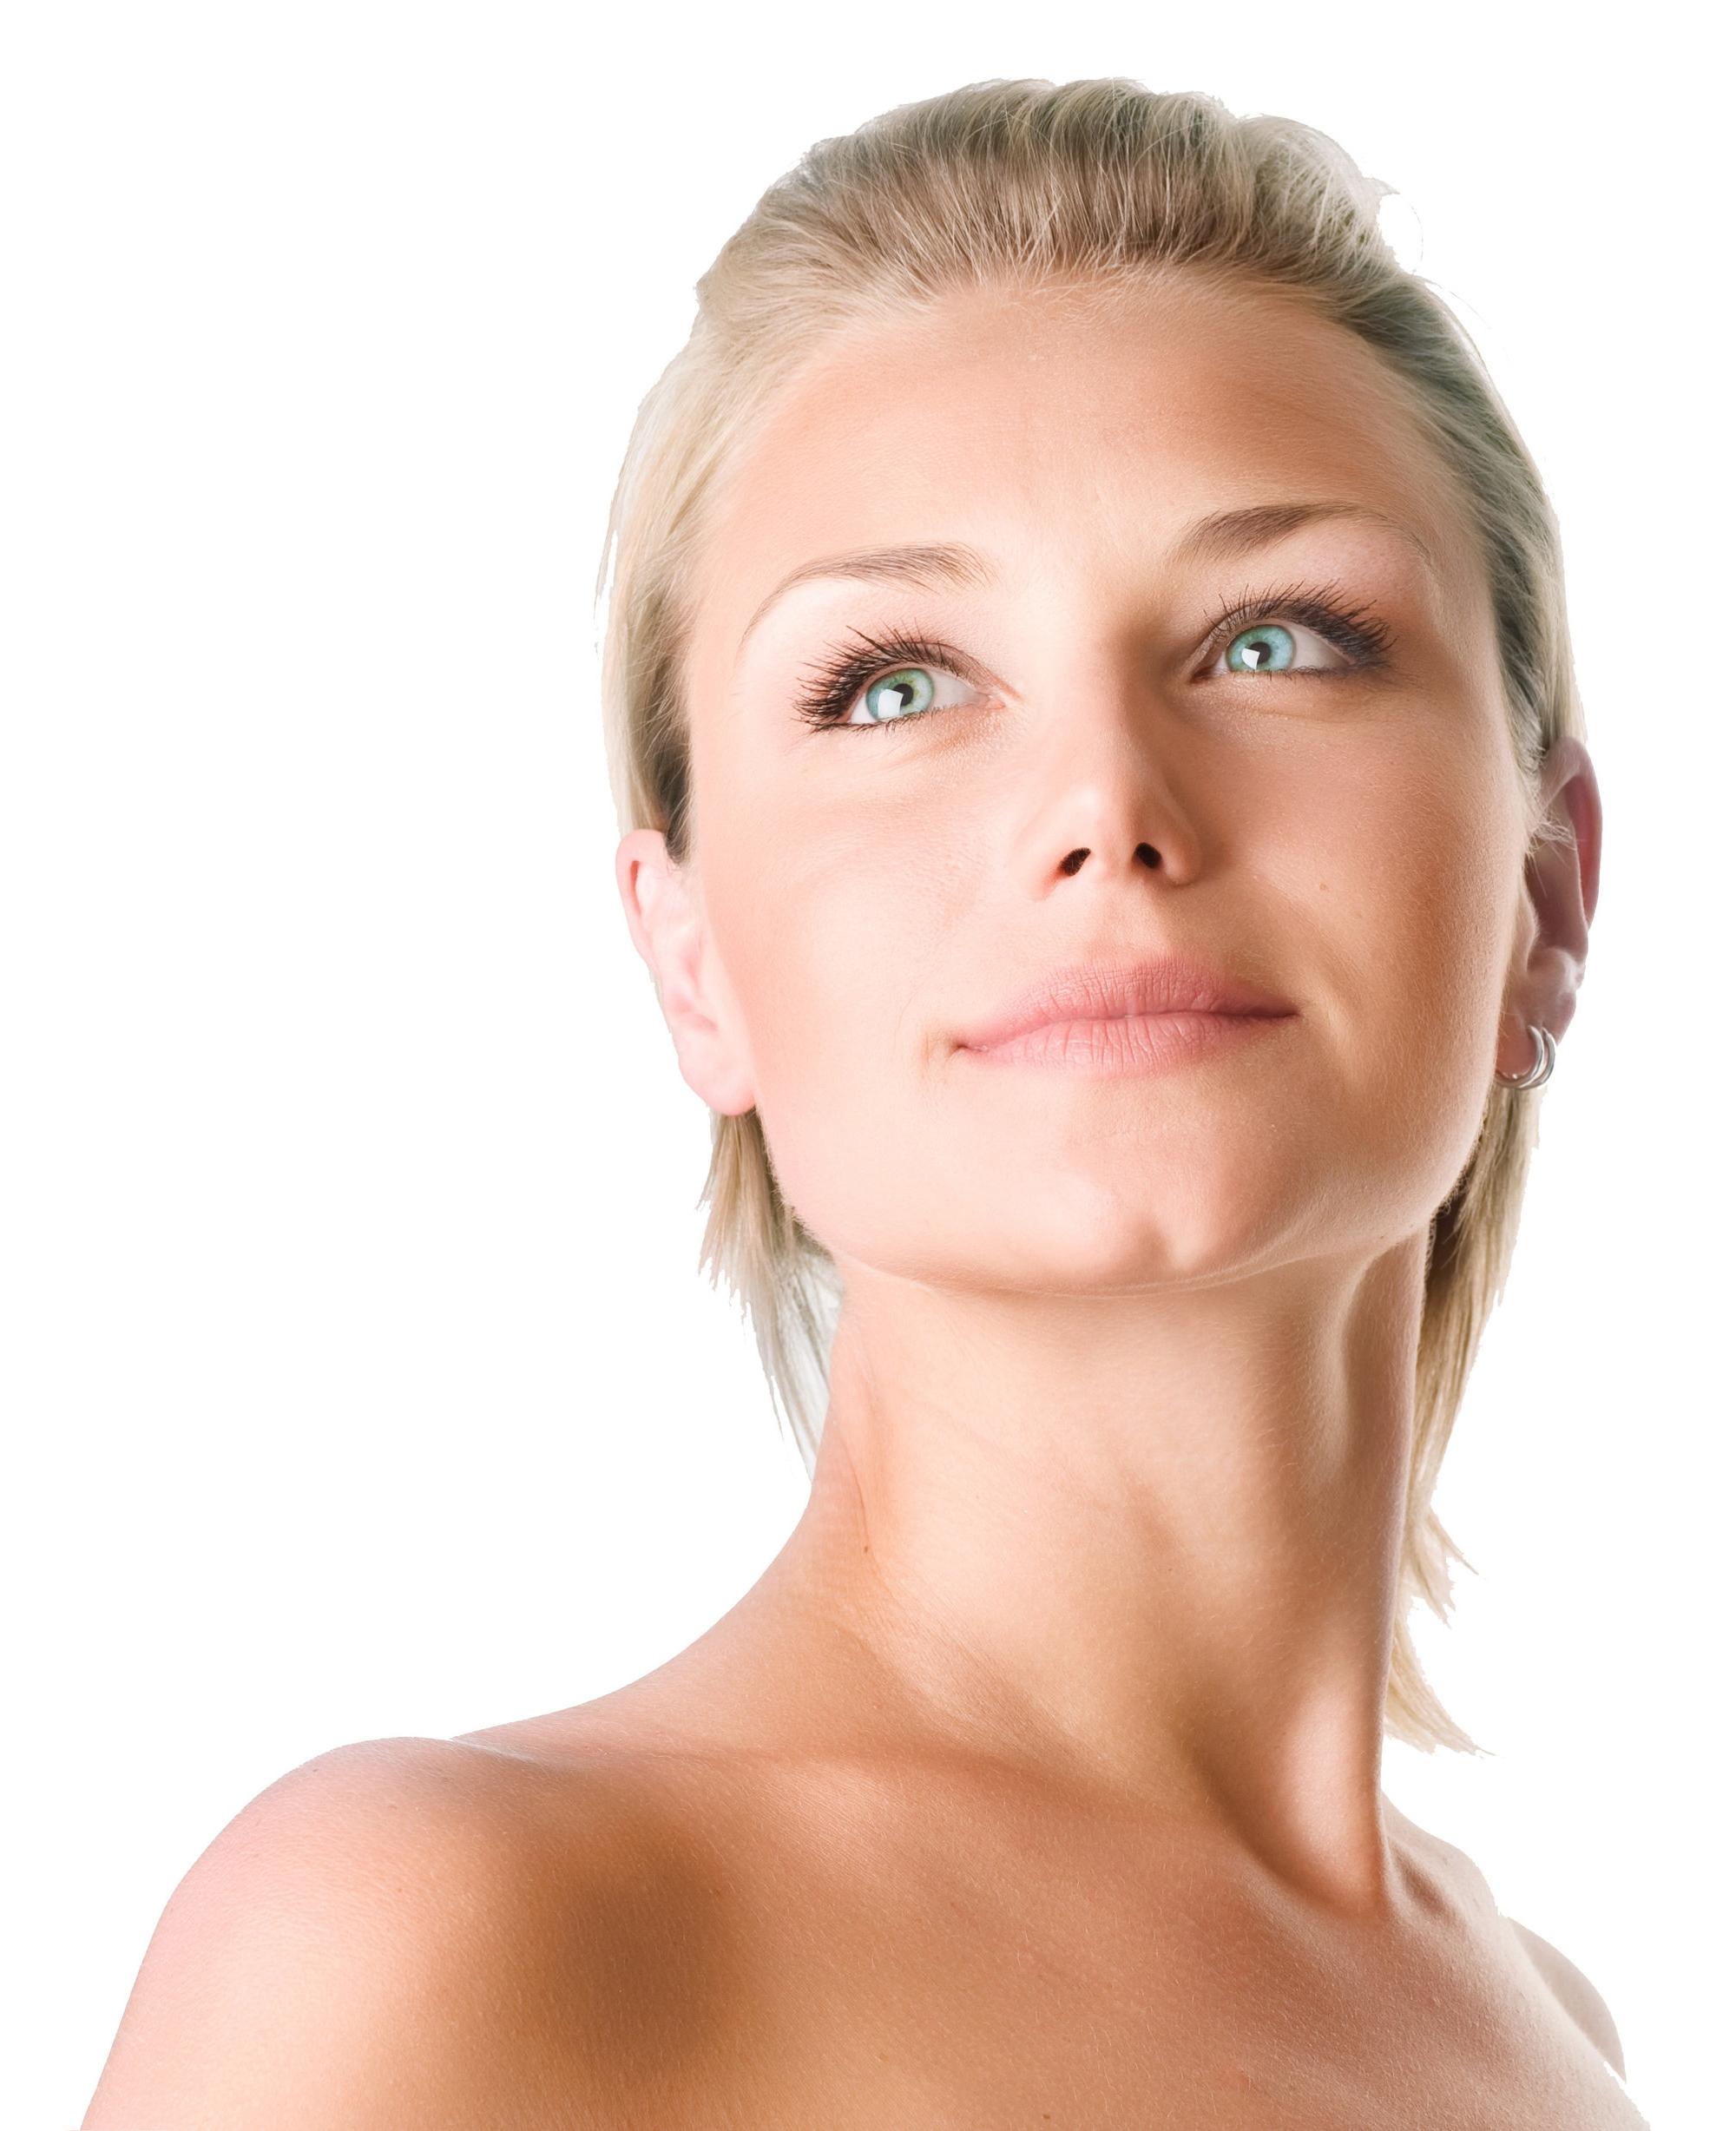 Full Face - Package of 6Regular price $1380Promo price $699 Book Now & Get + 1 Facial Skin Tightening Procedure ($249 value)